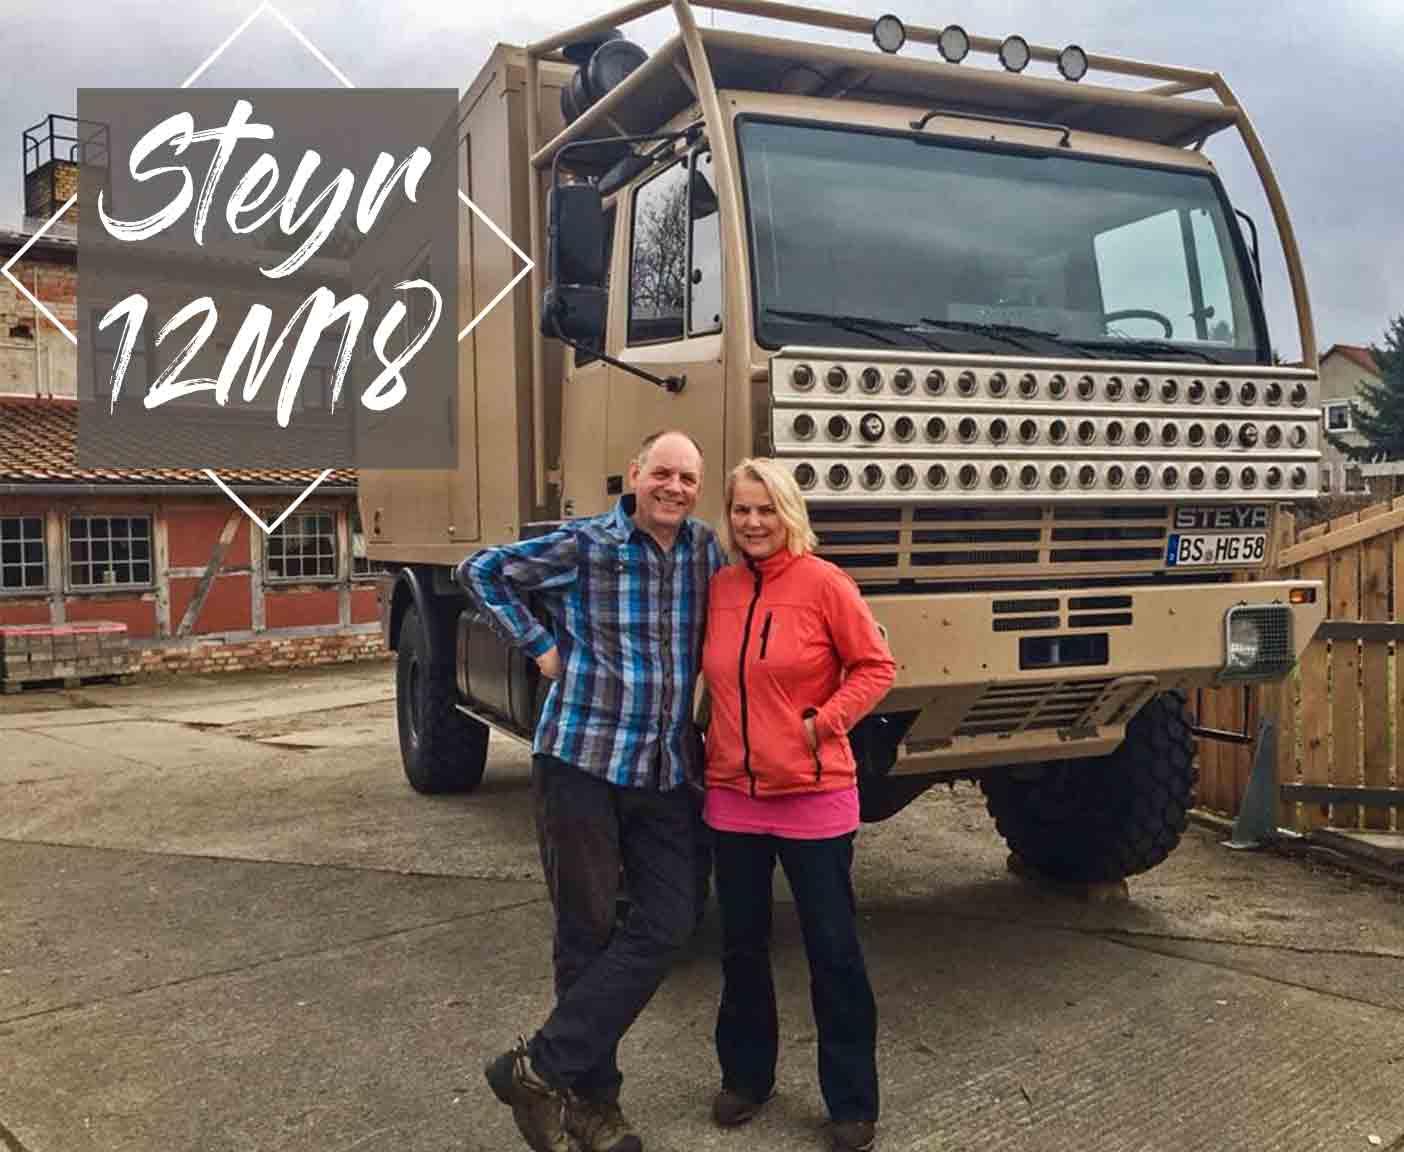 steyr-12M18-expeditionsmobil-fernreisefahrzeug-camper